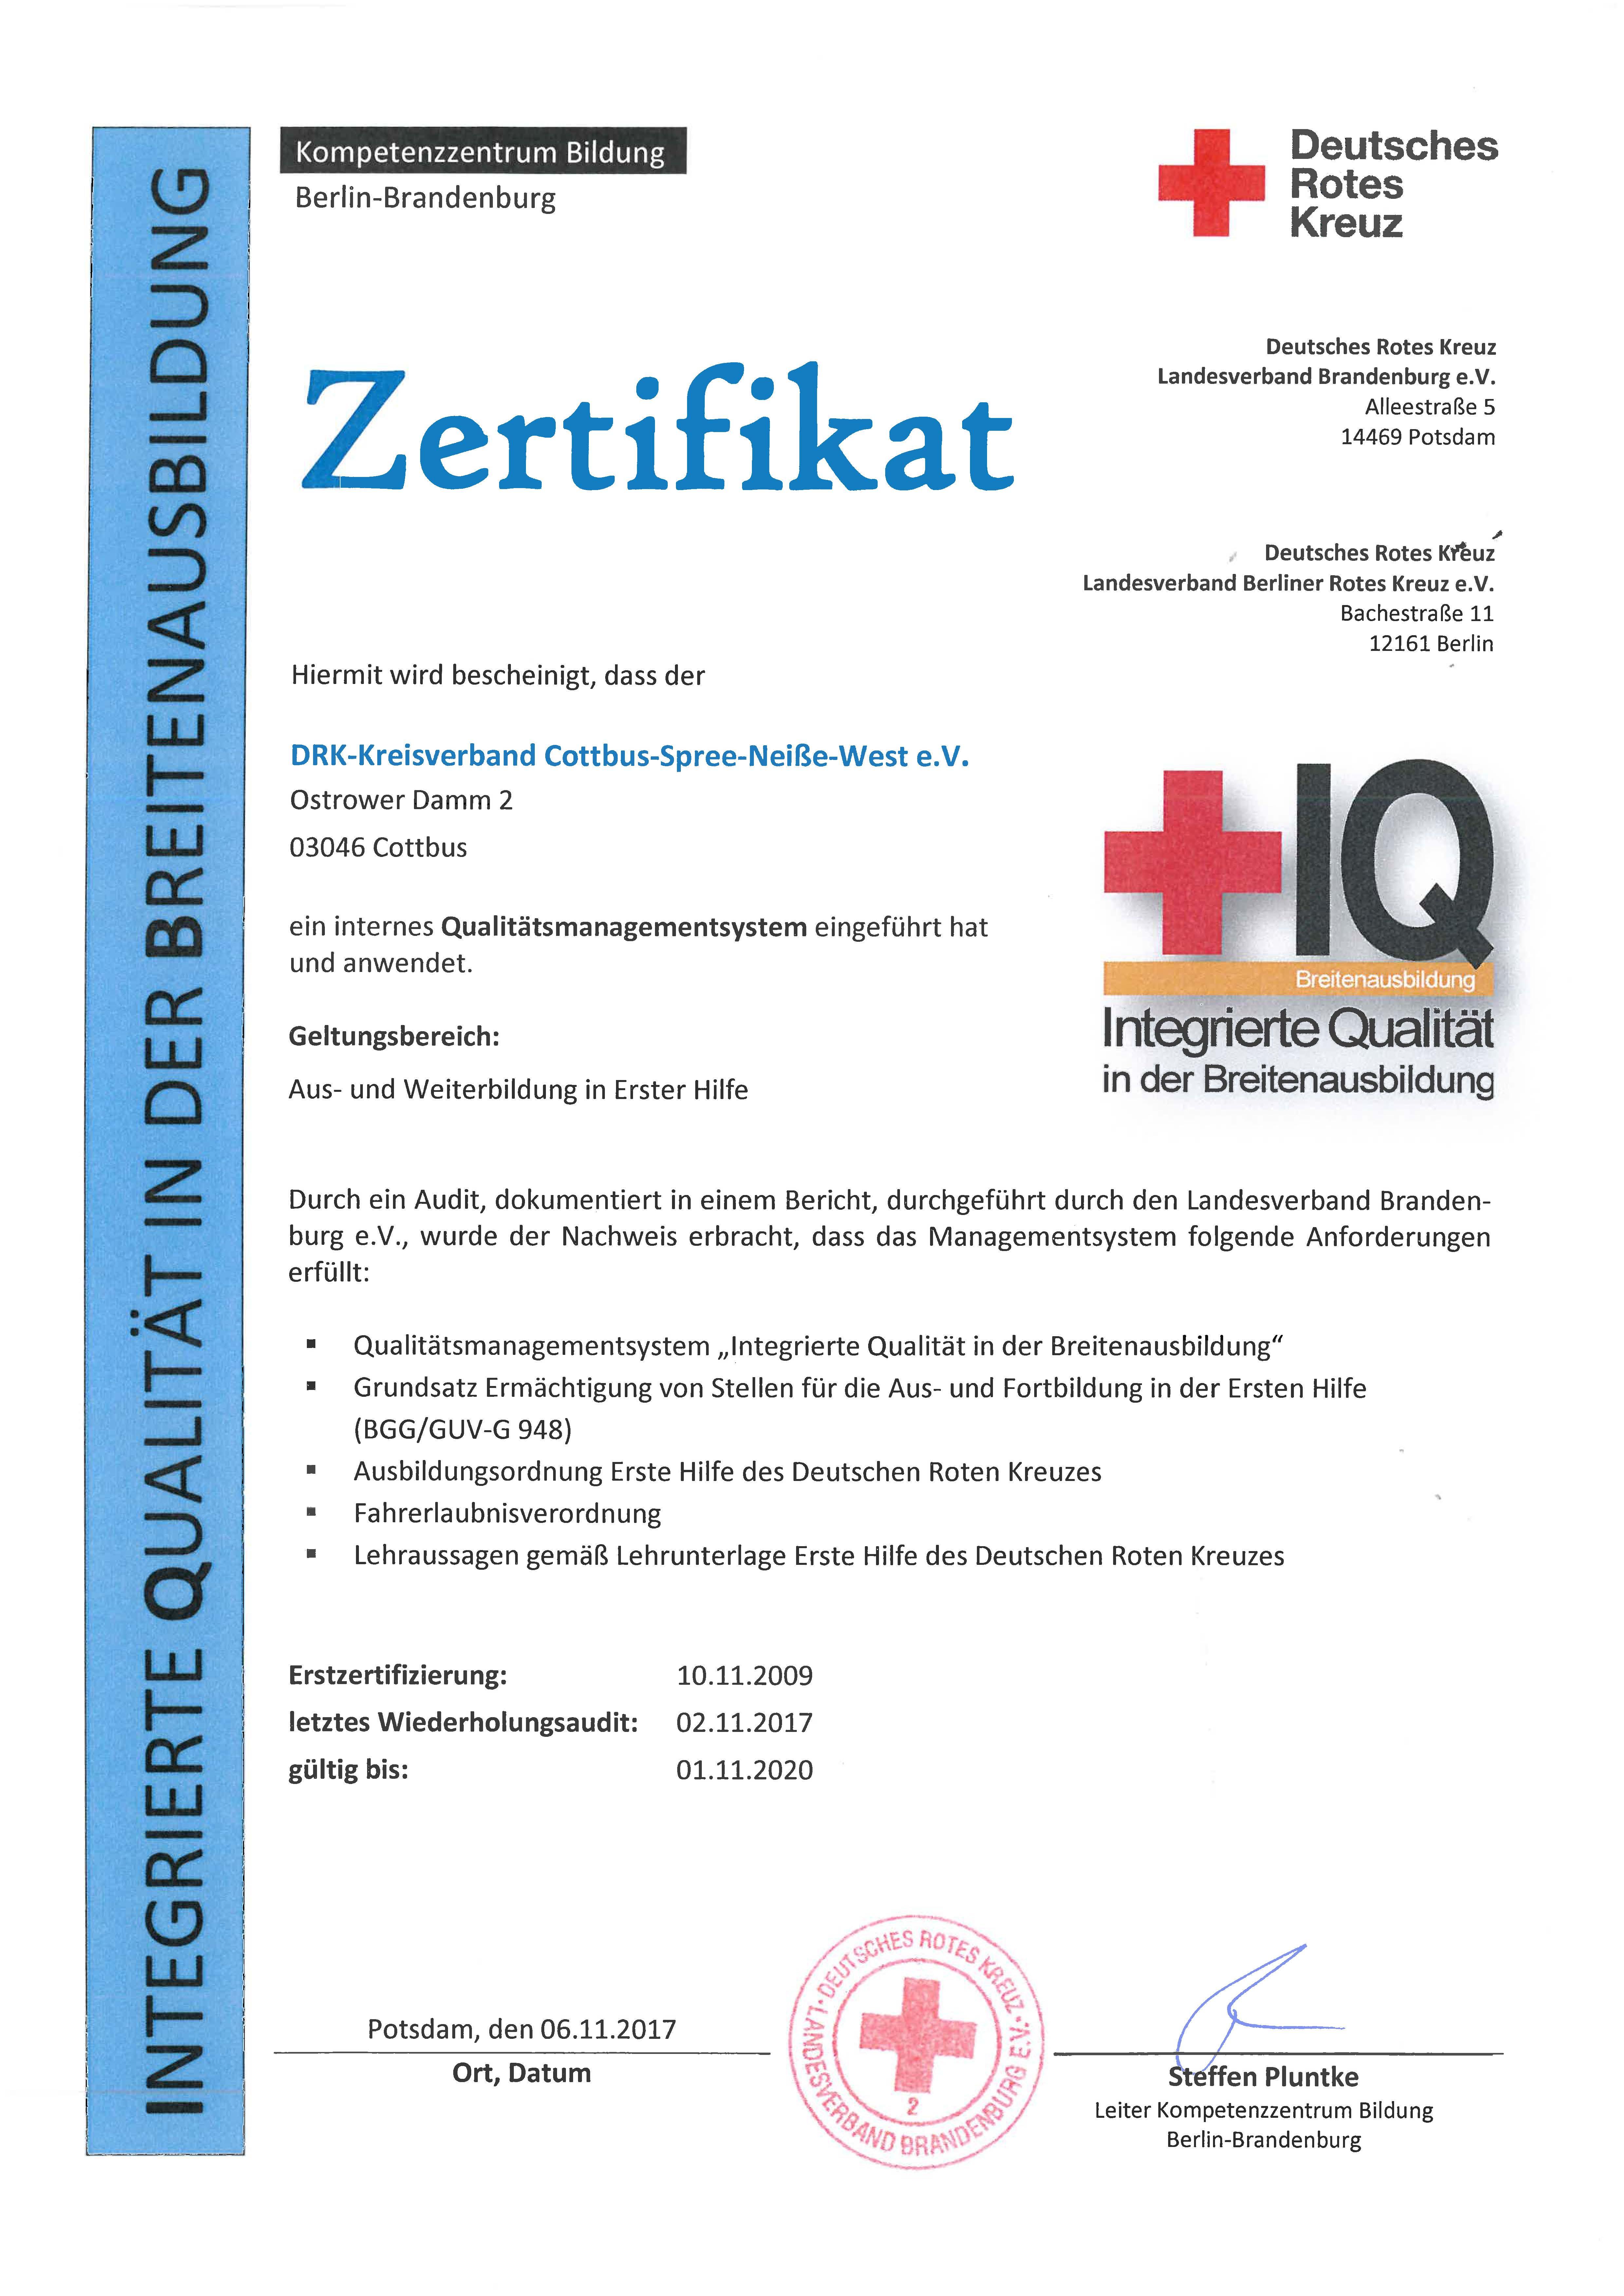 Wunderbar Erster Platz Zertifikat Bilder - FORTSETZUNG ARBEITSBLATT ...